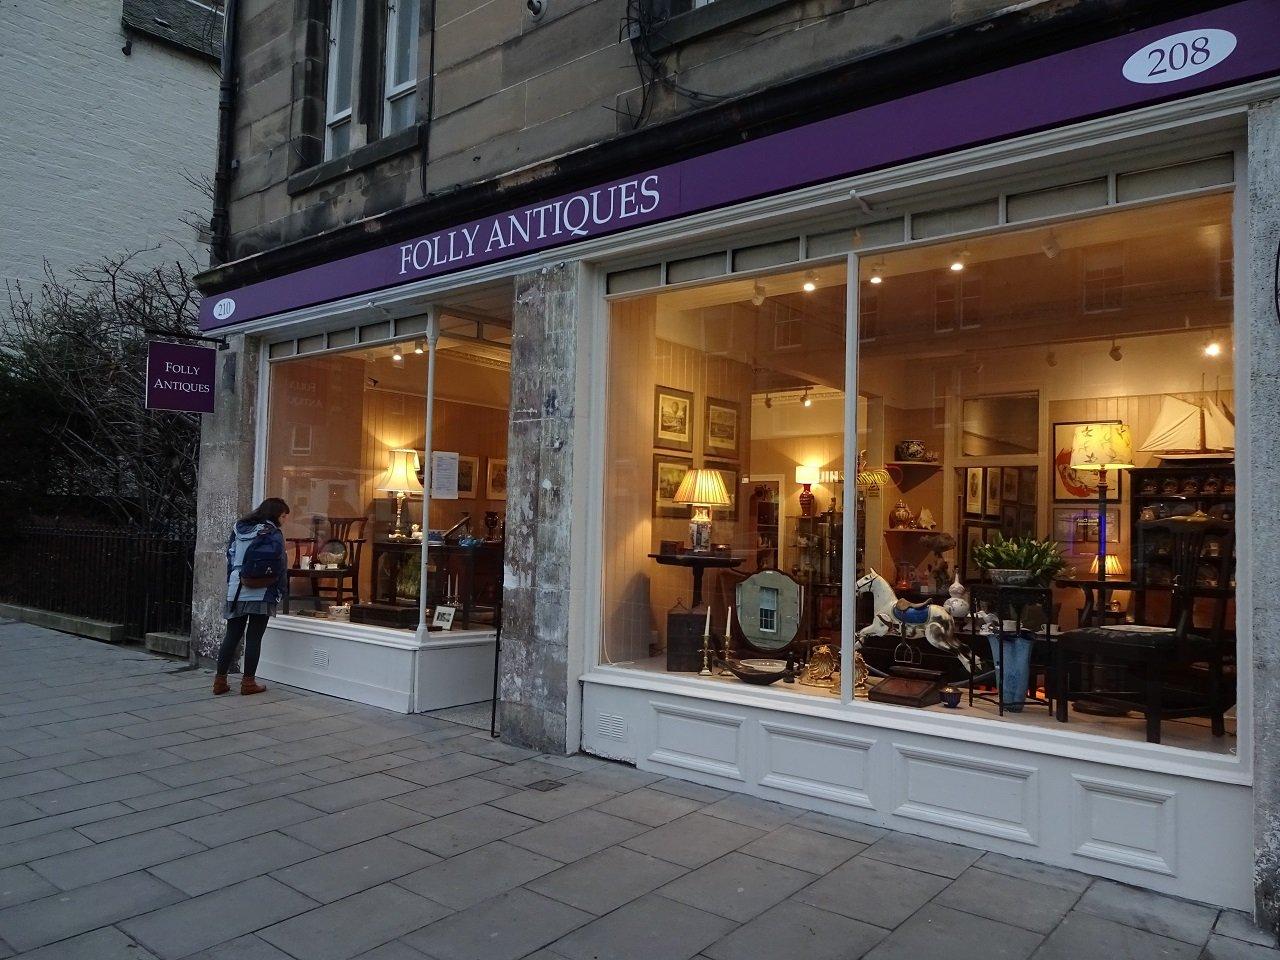 Folly antiques shop